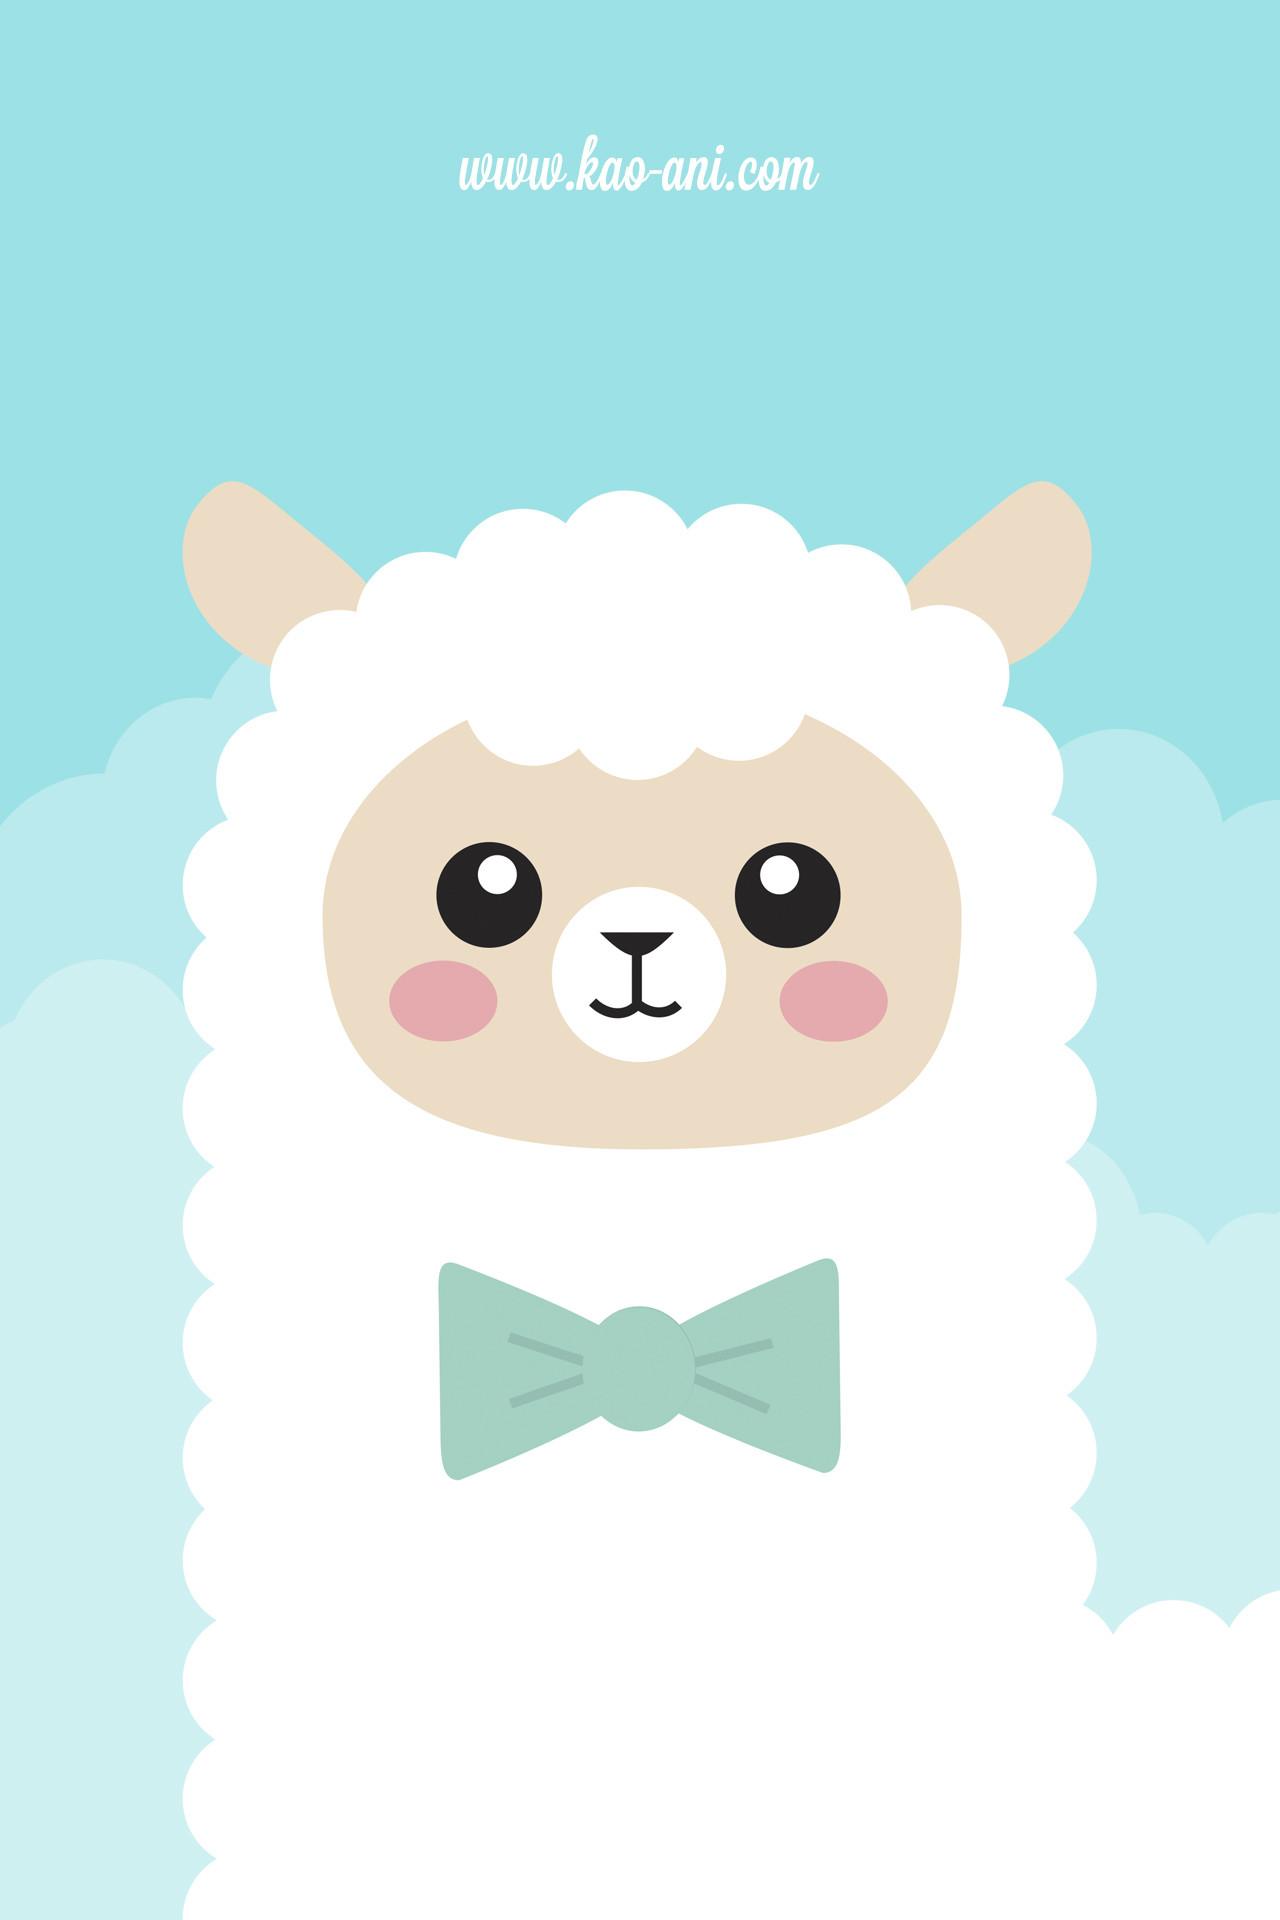 Alpaca iPhone Wallpaper – Kao-ani.com